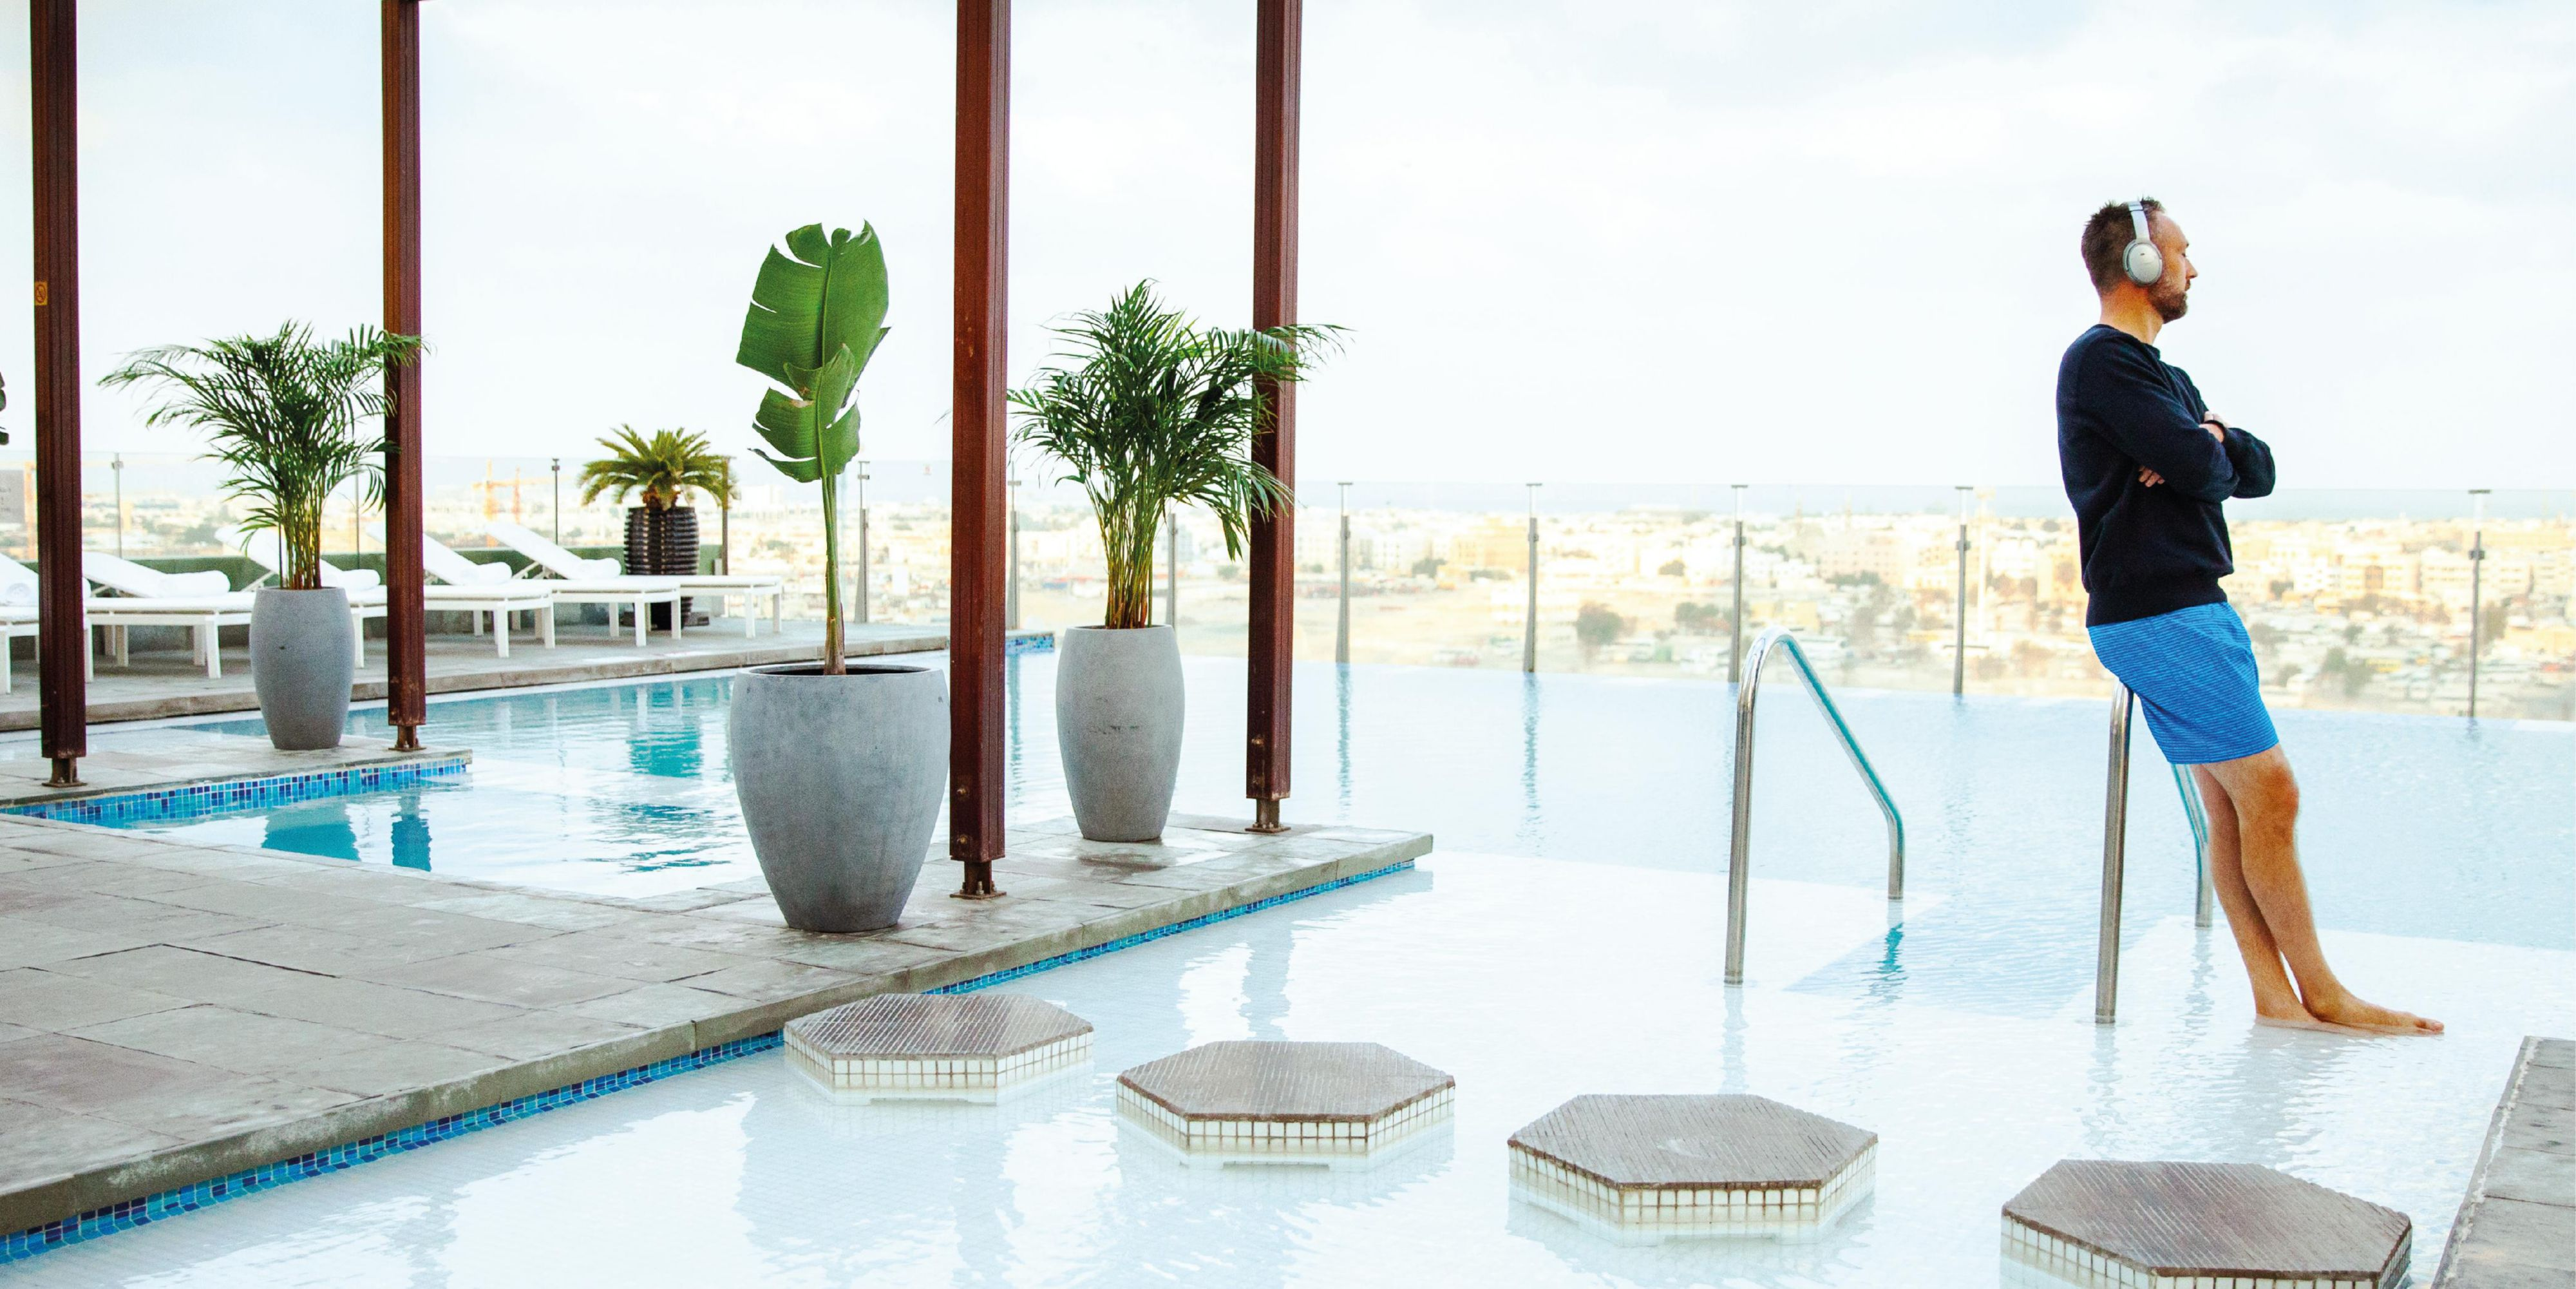 Infinity pool, voco Dubai, view of Jumierah Beach form 7th Floor